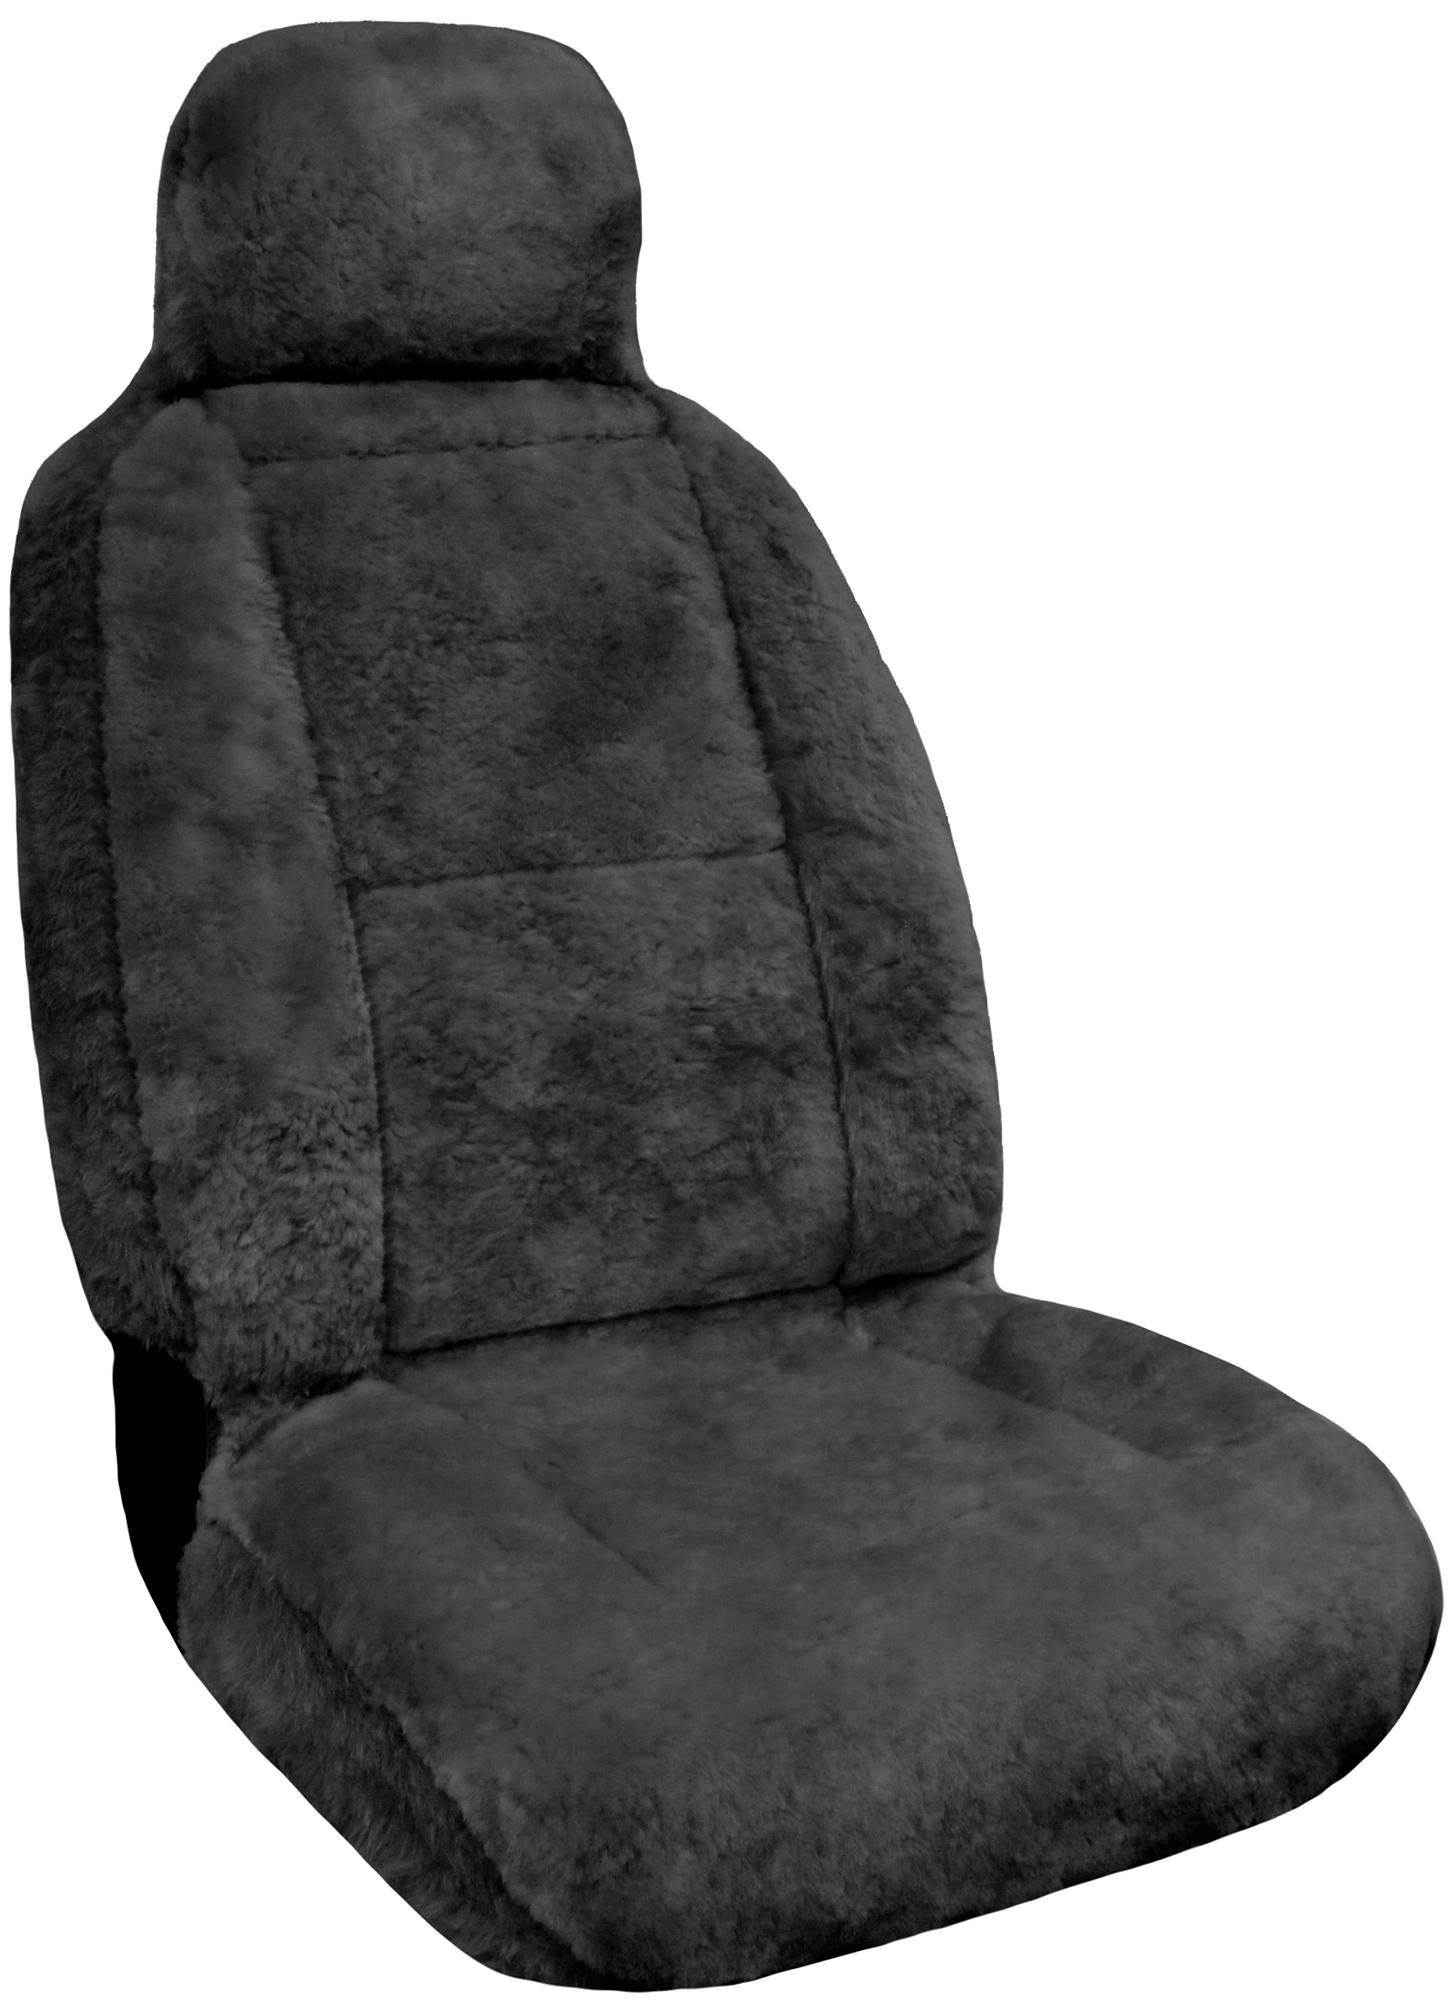 eurow sheepskin seat cover new xl design premium pelt gray ebay. Black Bedroom Furniture Sets. Home Design Ideas